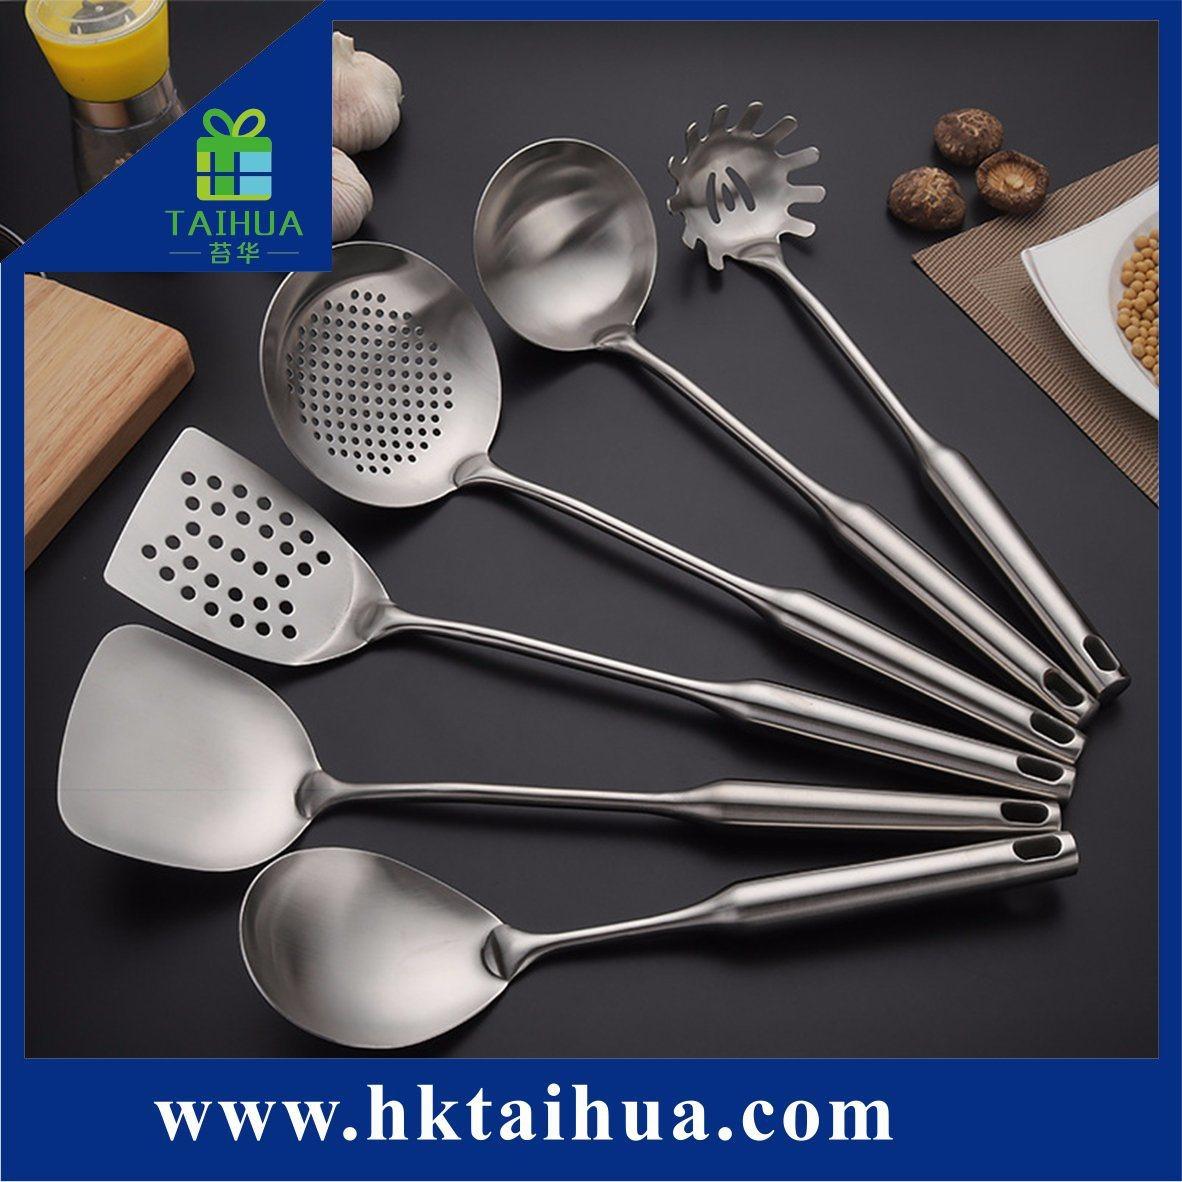 Stainless Steel Kitchenware Set